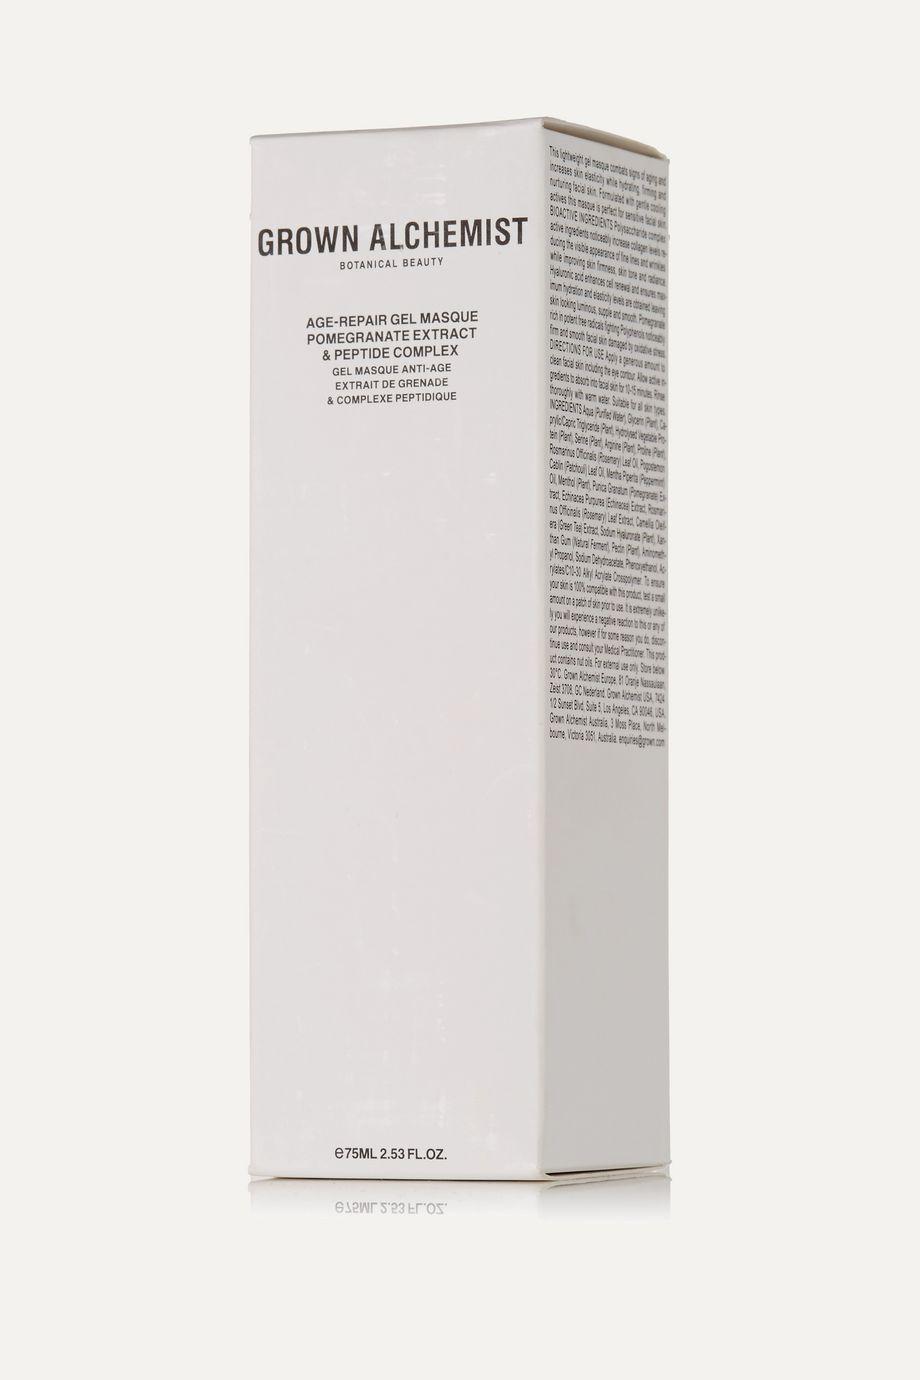 Grown Alchemist Age-Repair Gel Masque, 75 ml – Gelmaske